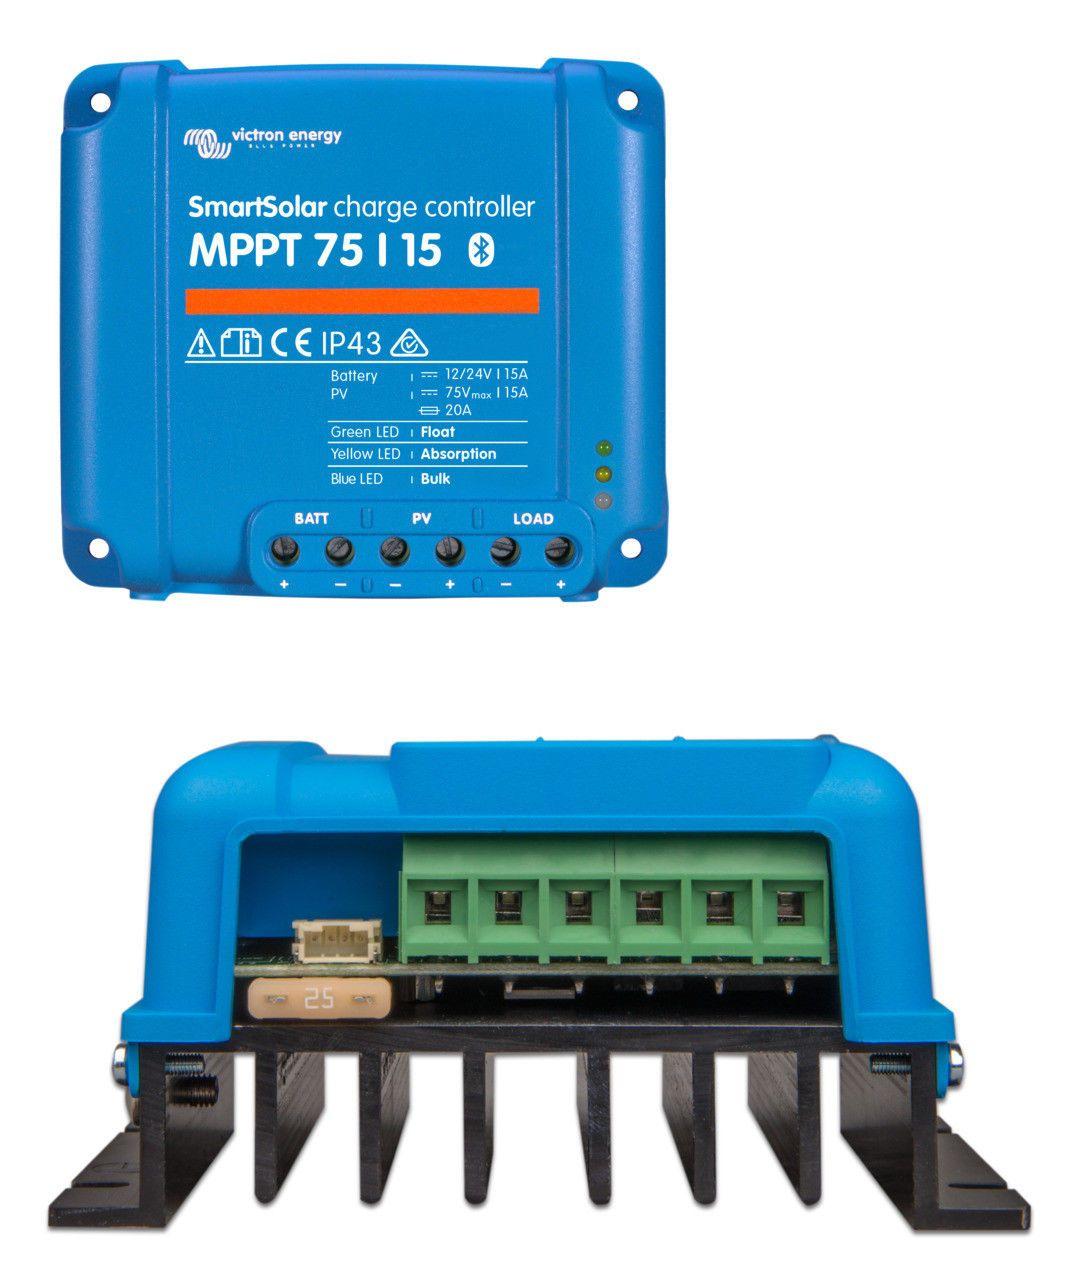 Victron Smartsolar Mppt 75 15 Charge Controller 691042693765 Ebay Energy Green Led Ebay